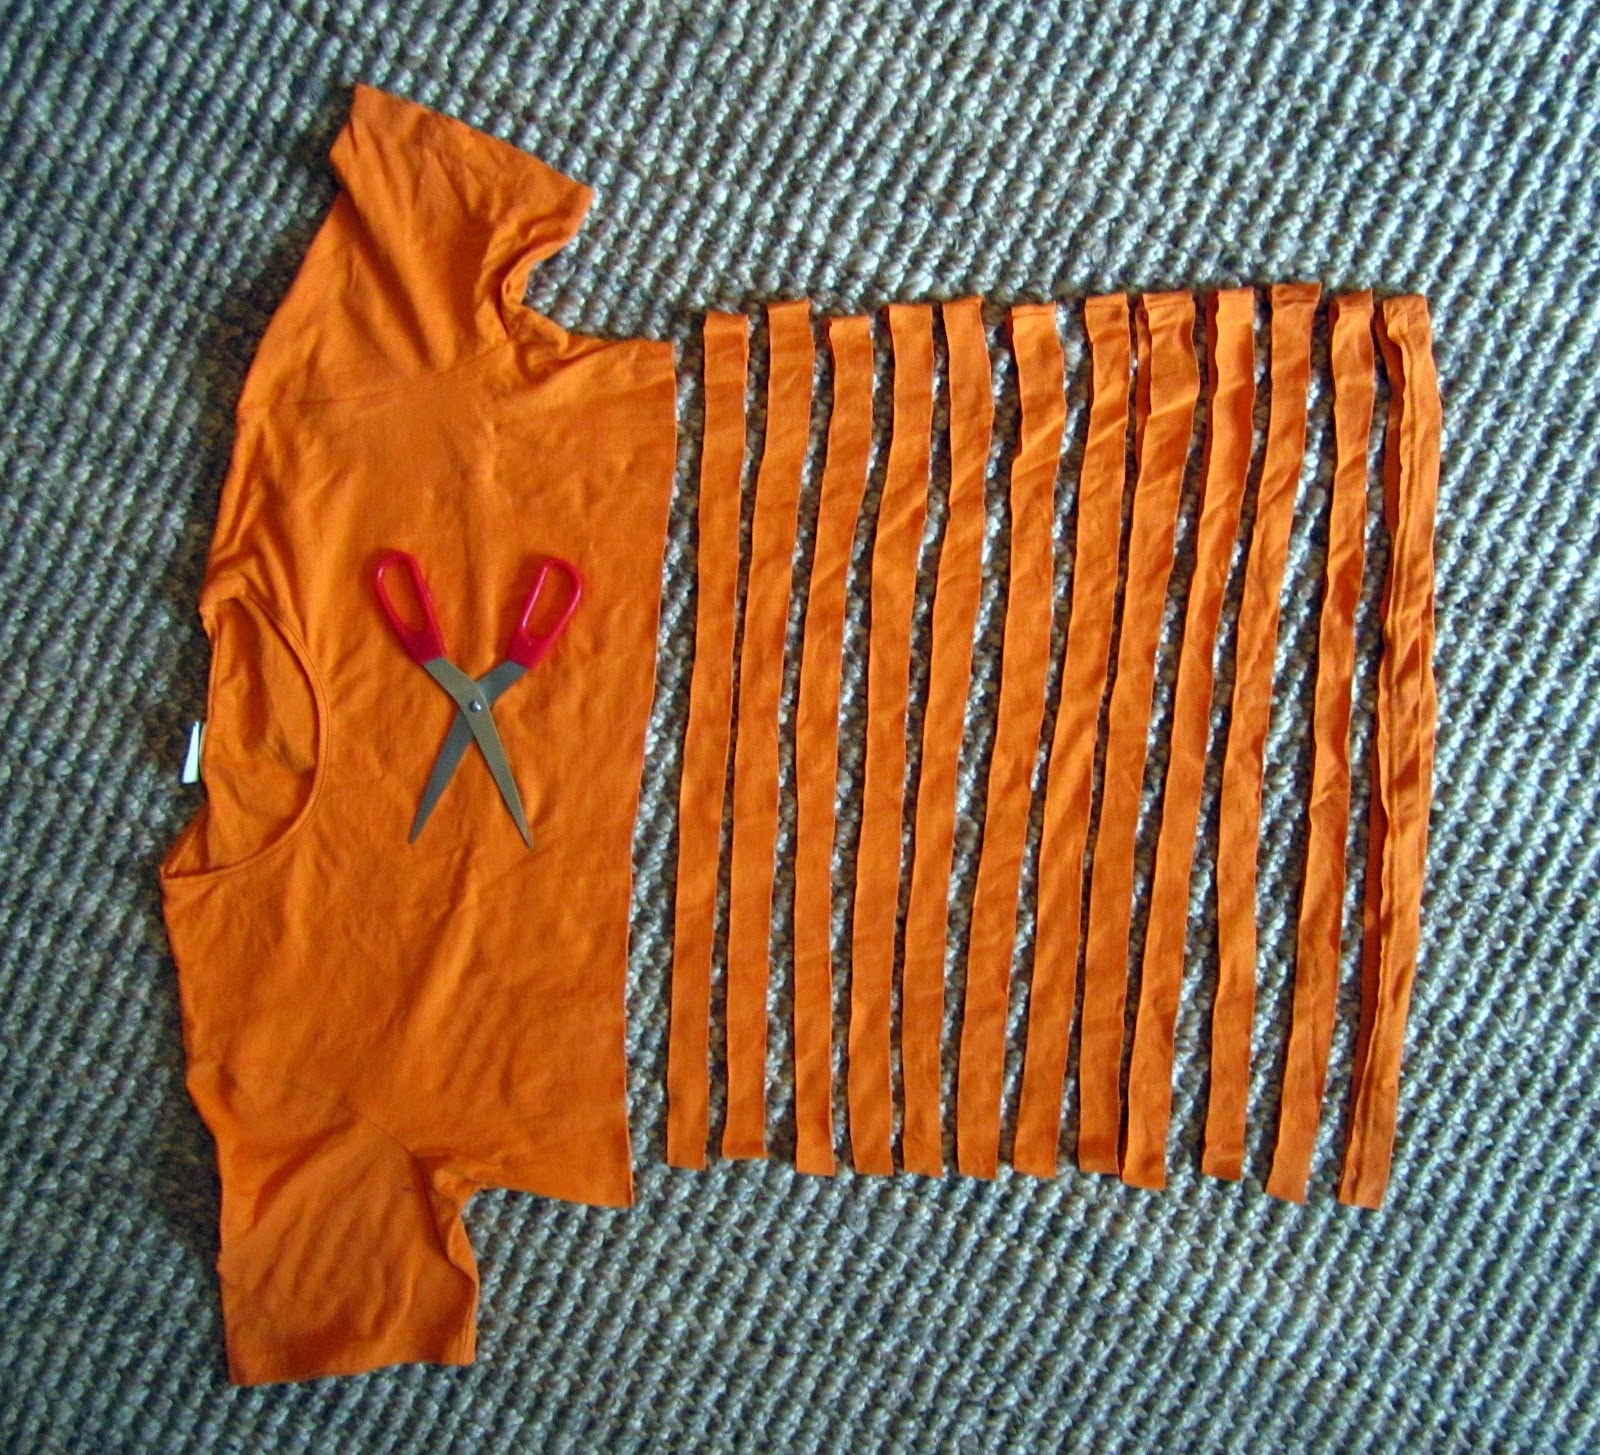 passo passo tapete camiseta velha 2